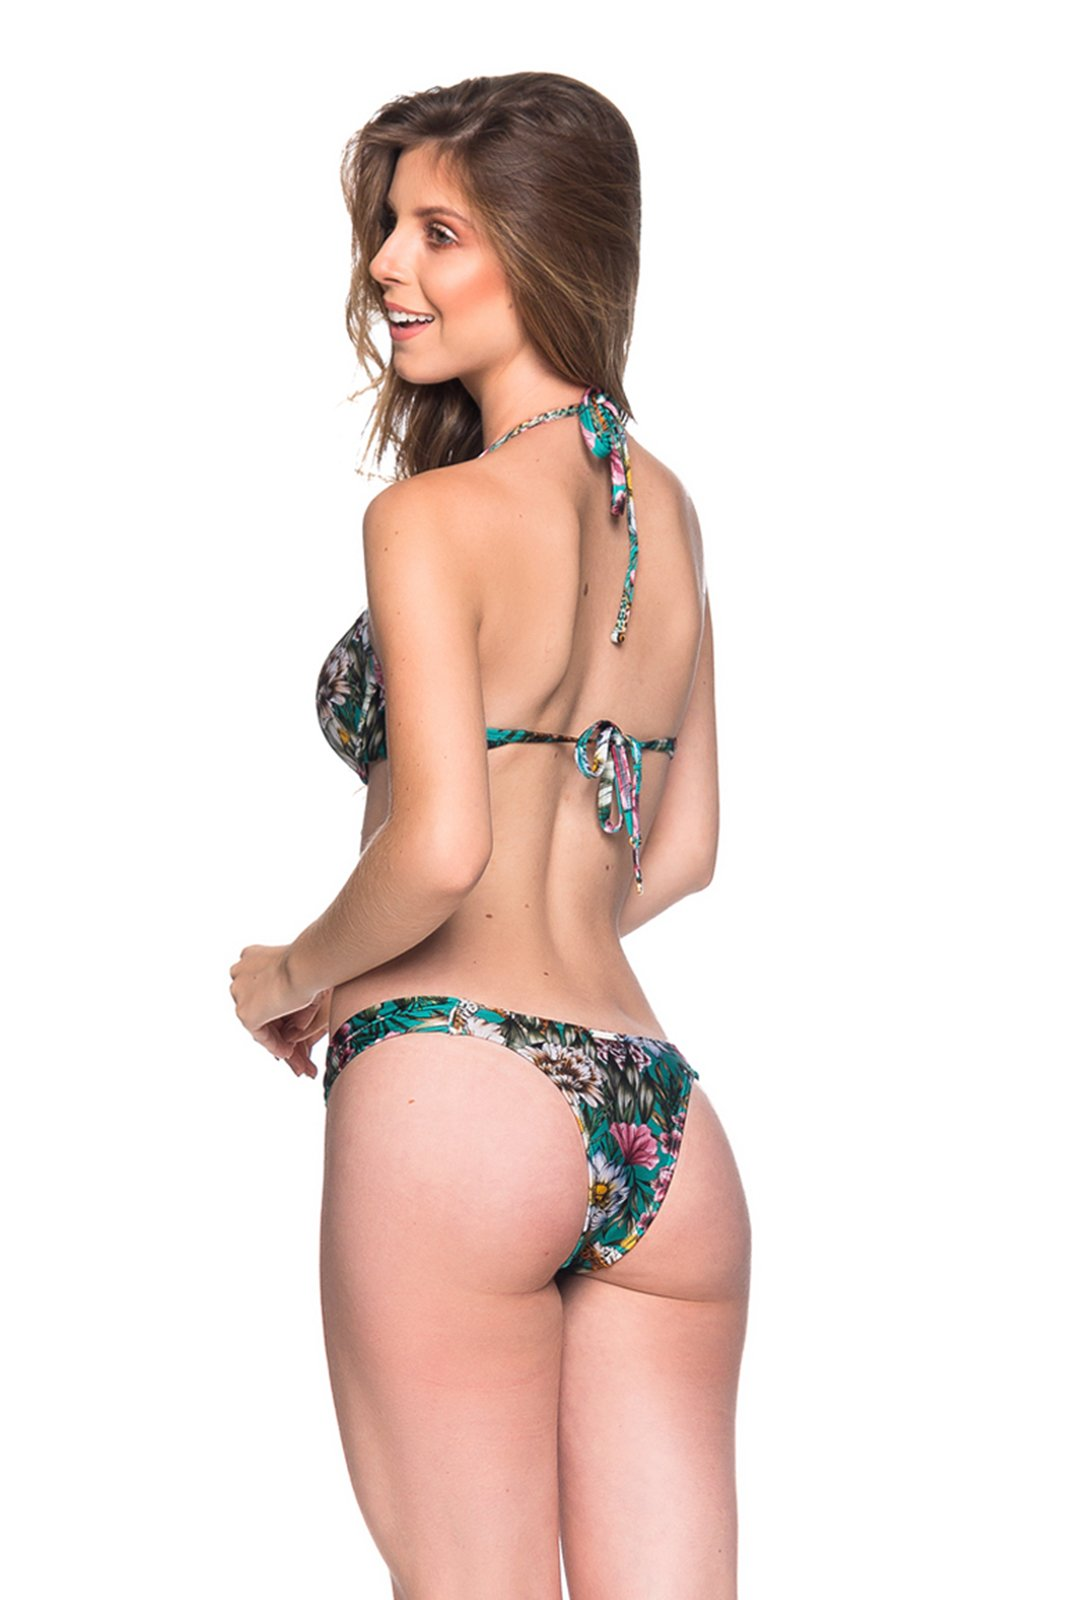 5e75d29710 Green Floral Push-up Balconette Bikini - Bolha Tropical Garden - La ...